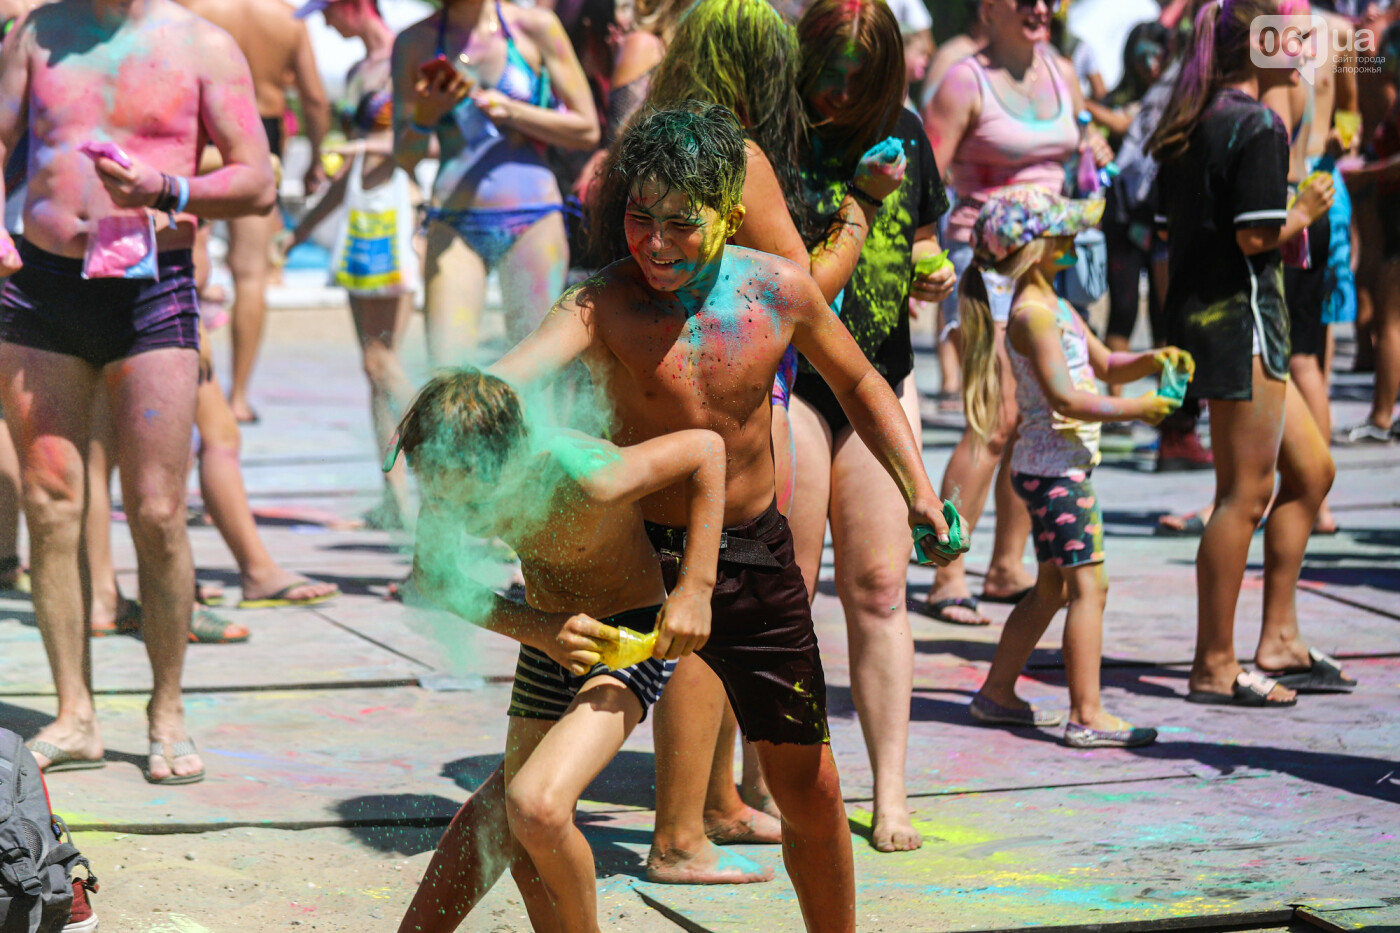 Сотни запорожцев приняли участие в фестивале красок Холи, - ФОТОРЕПОРТАЖ, фото-12